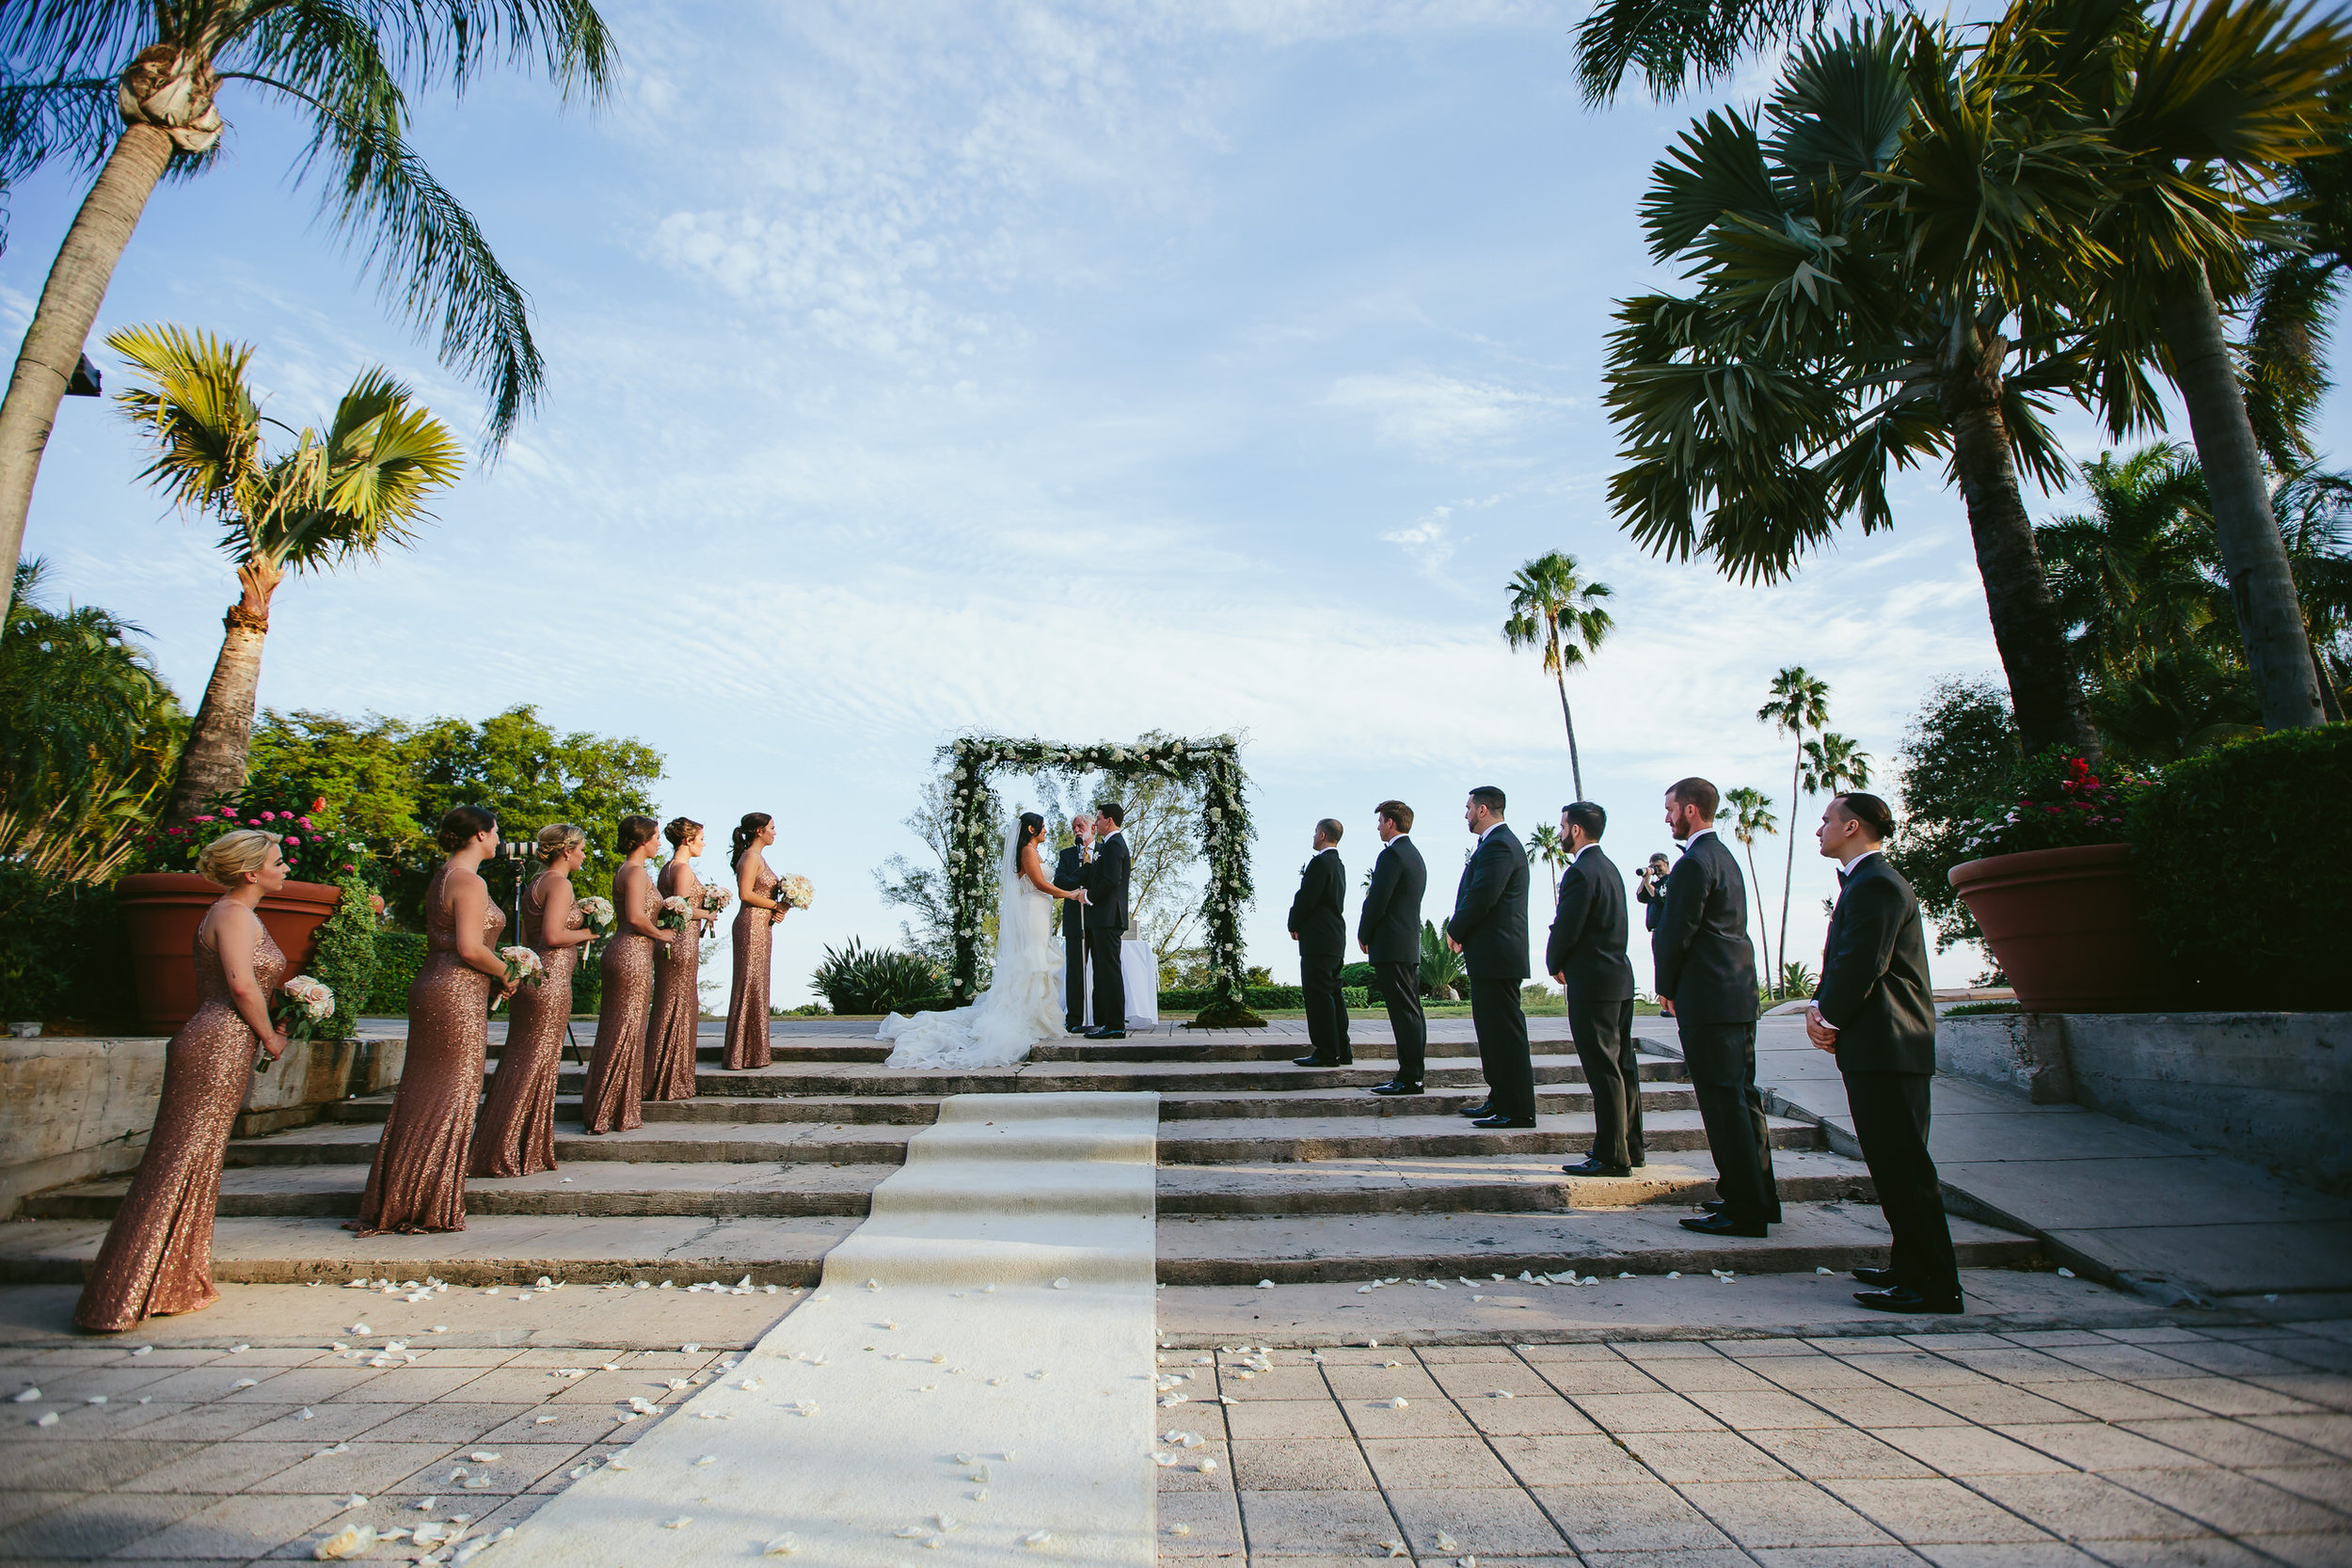 miami-biltmore-wedding-photographer-ceremony-steph-lynn-photo-22.jpg